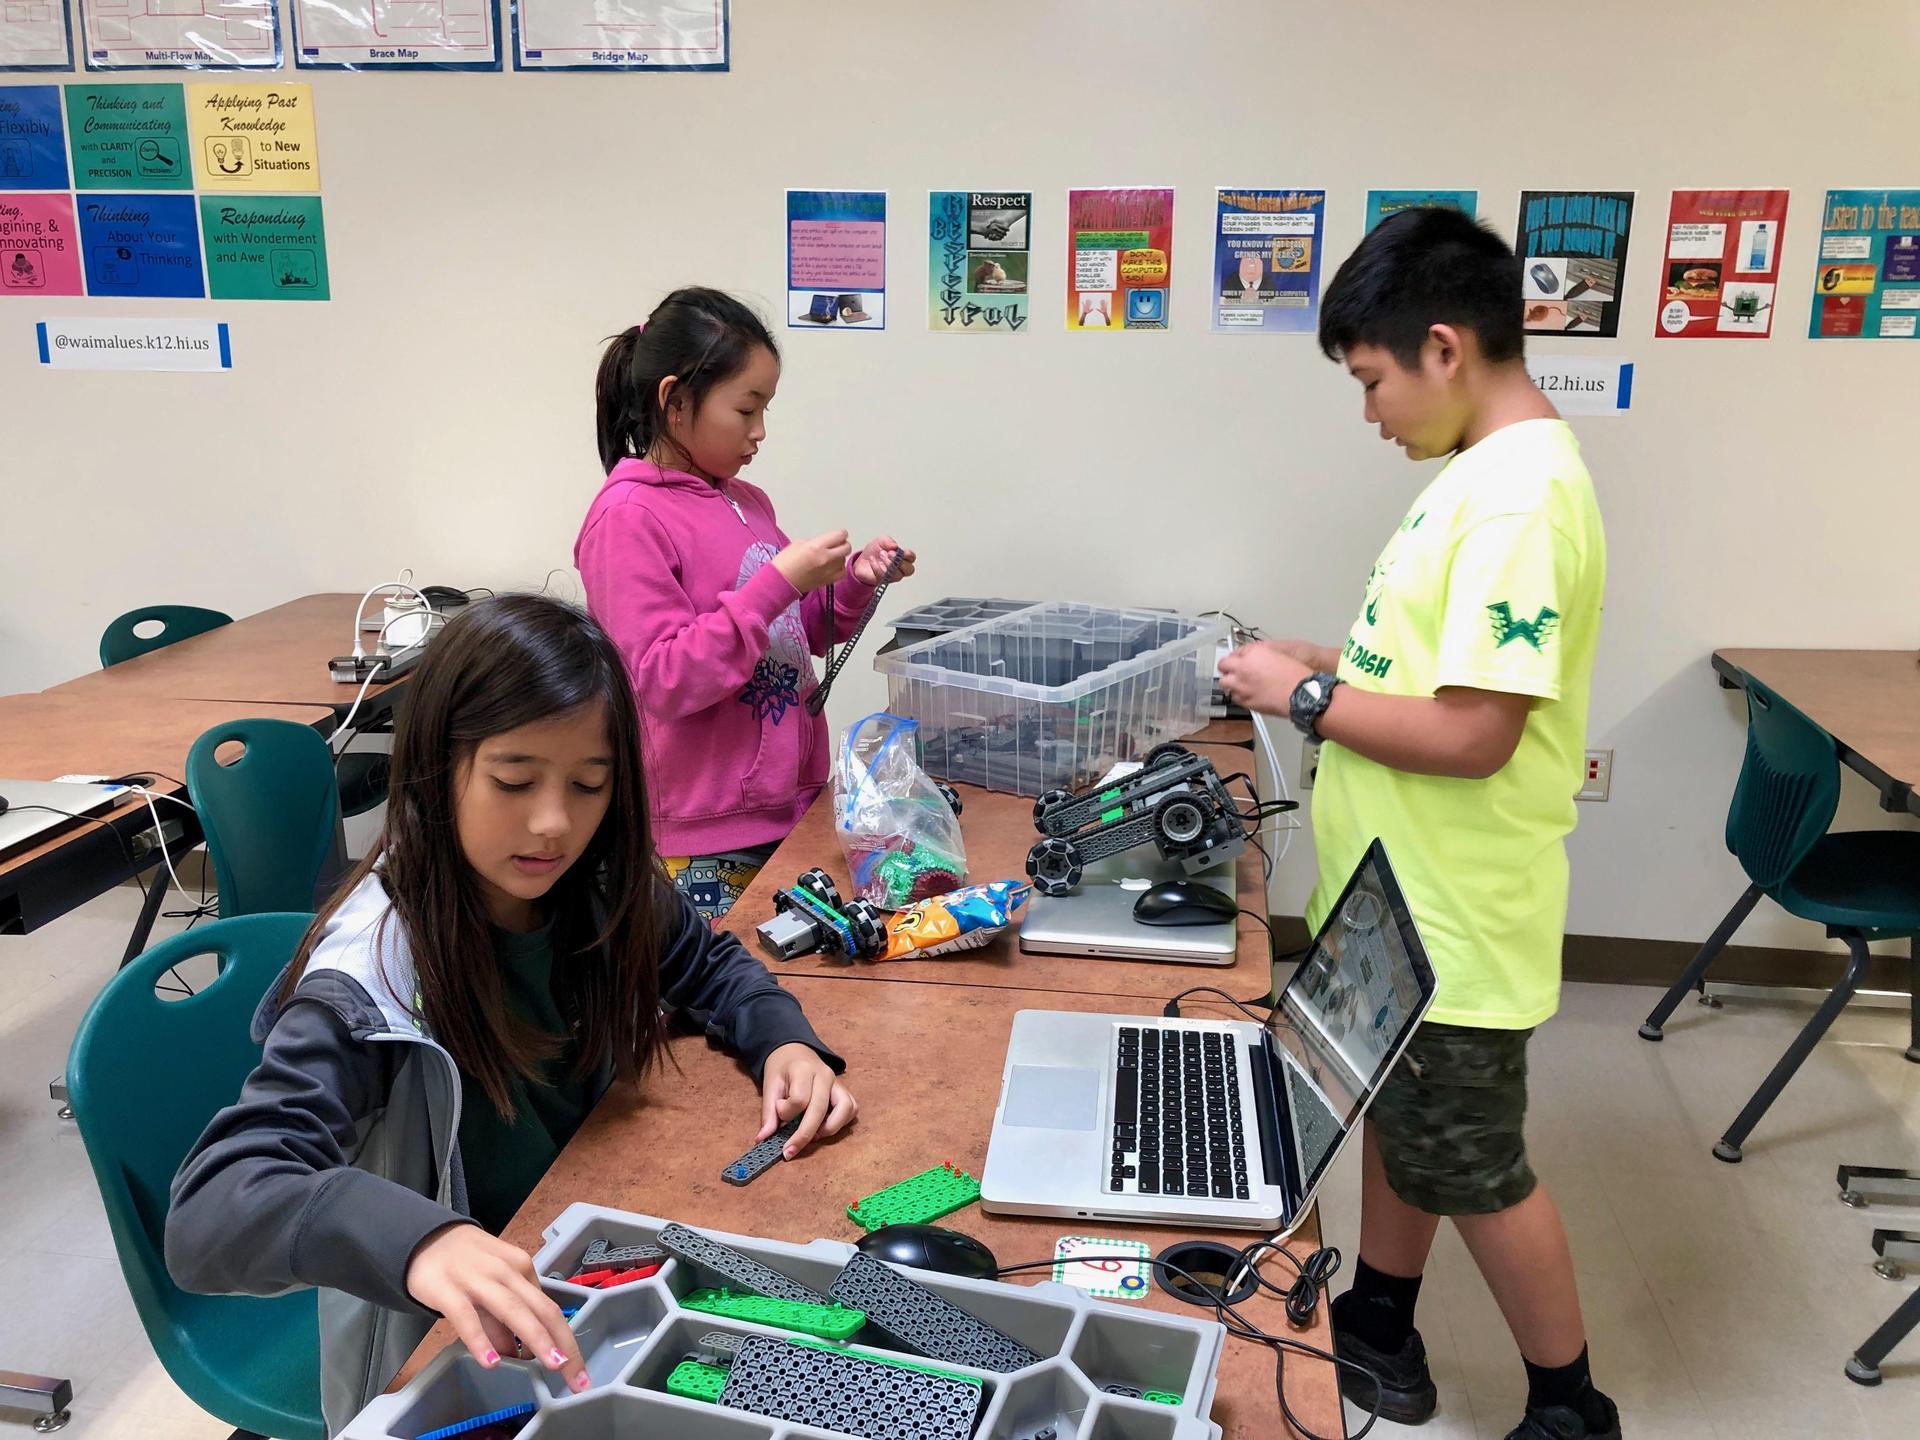 Robotics club students work on building robots.